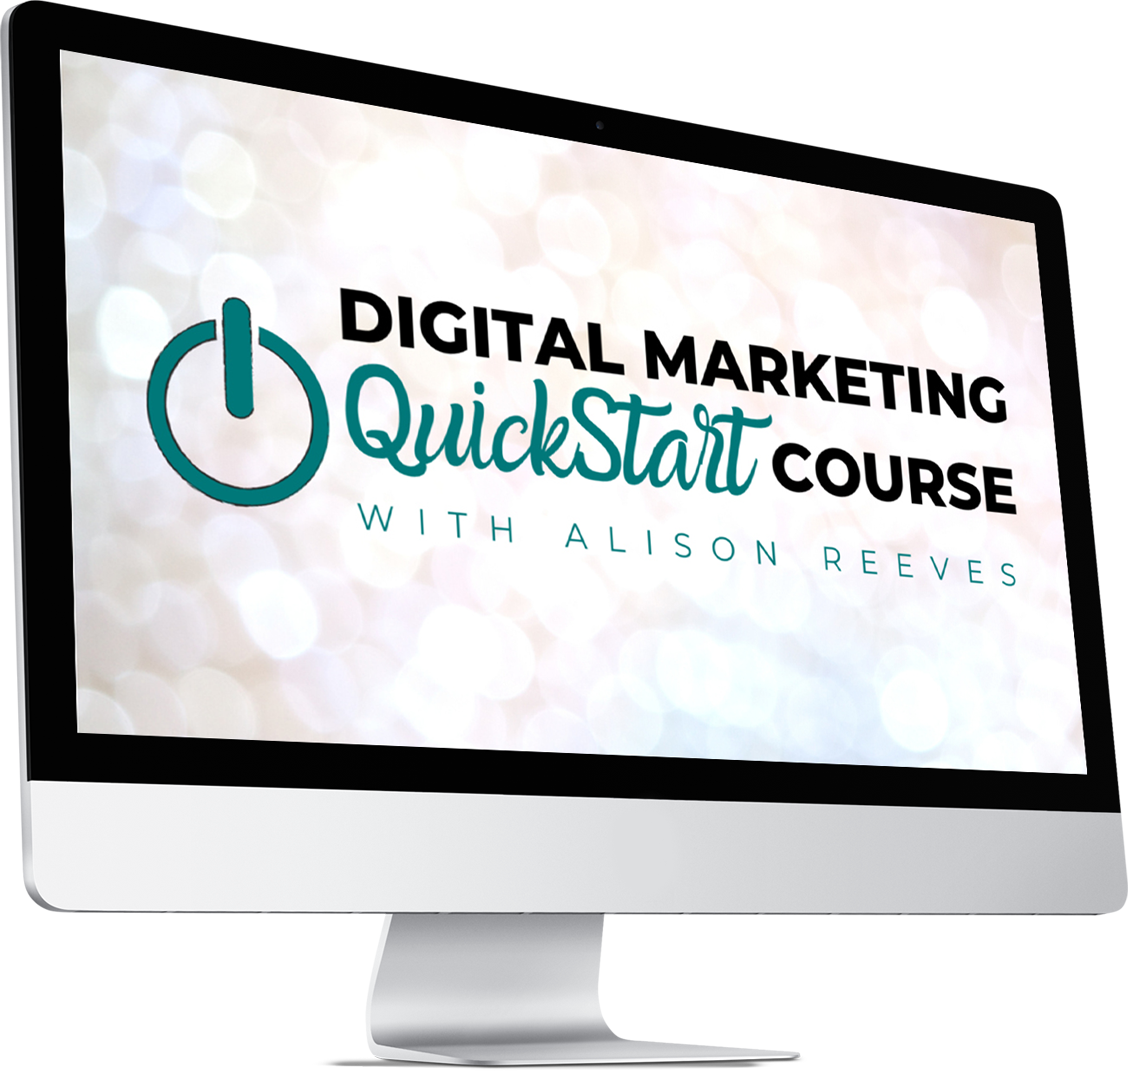 digital marketing quickstart course make money blogging